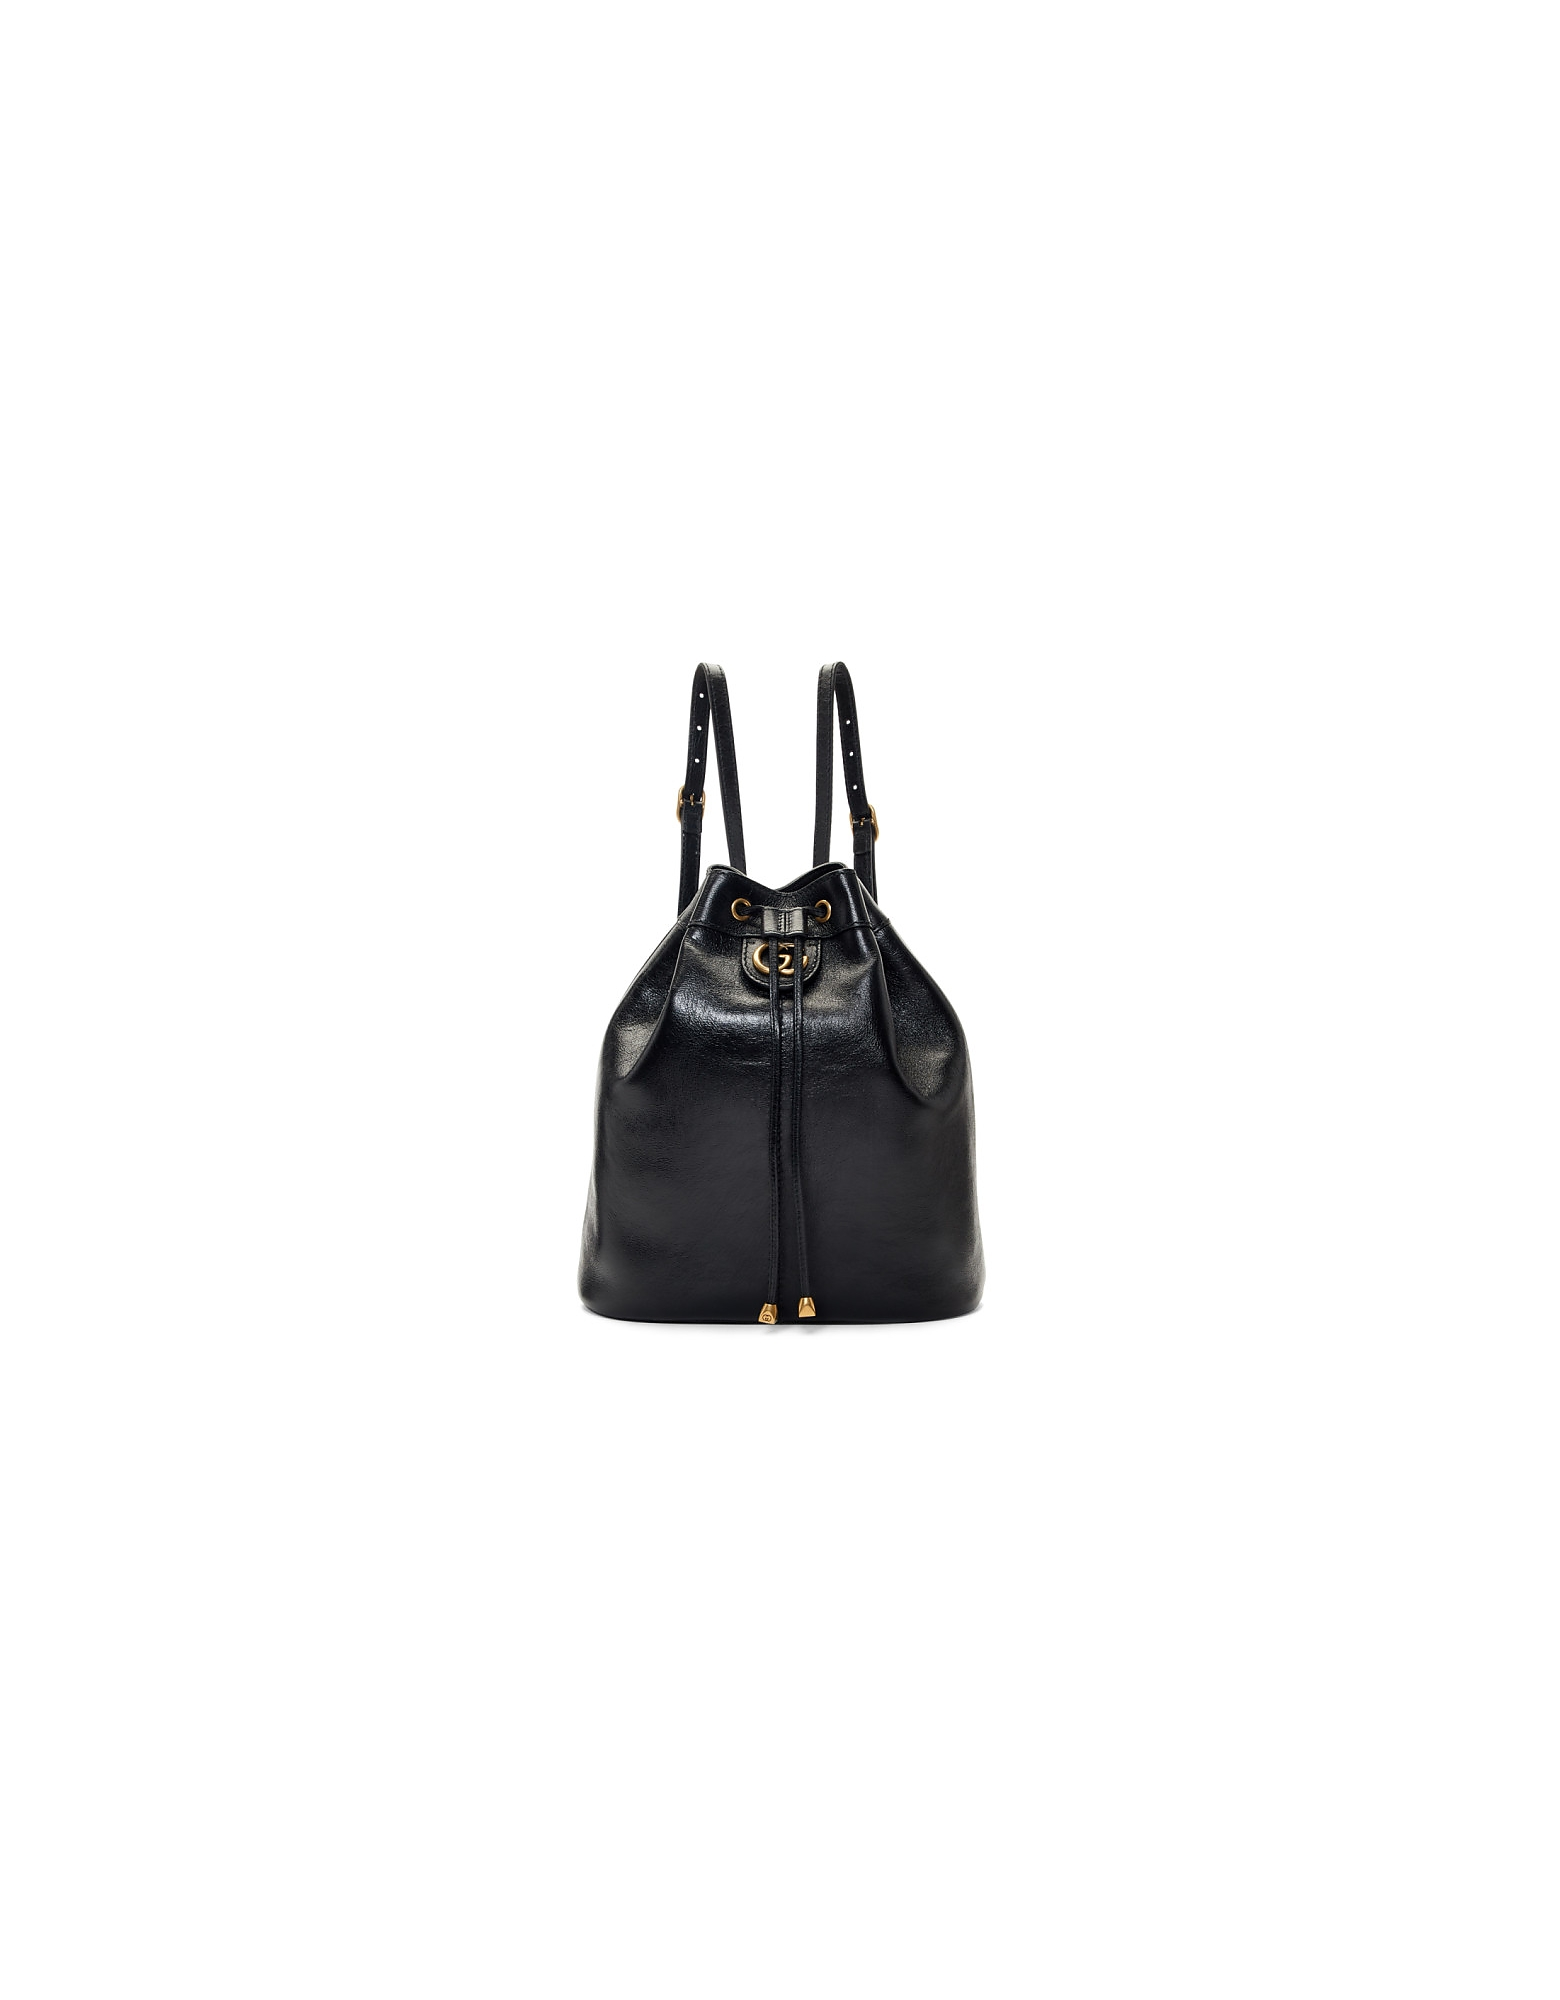 Gucci Designer Handbags, Black Rebelle Bag